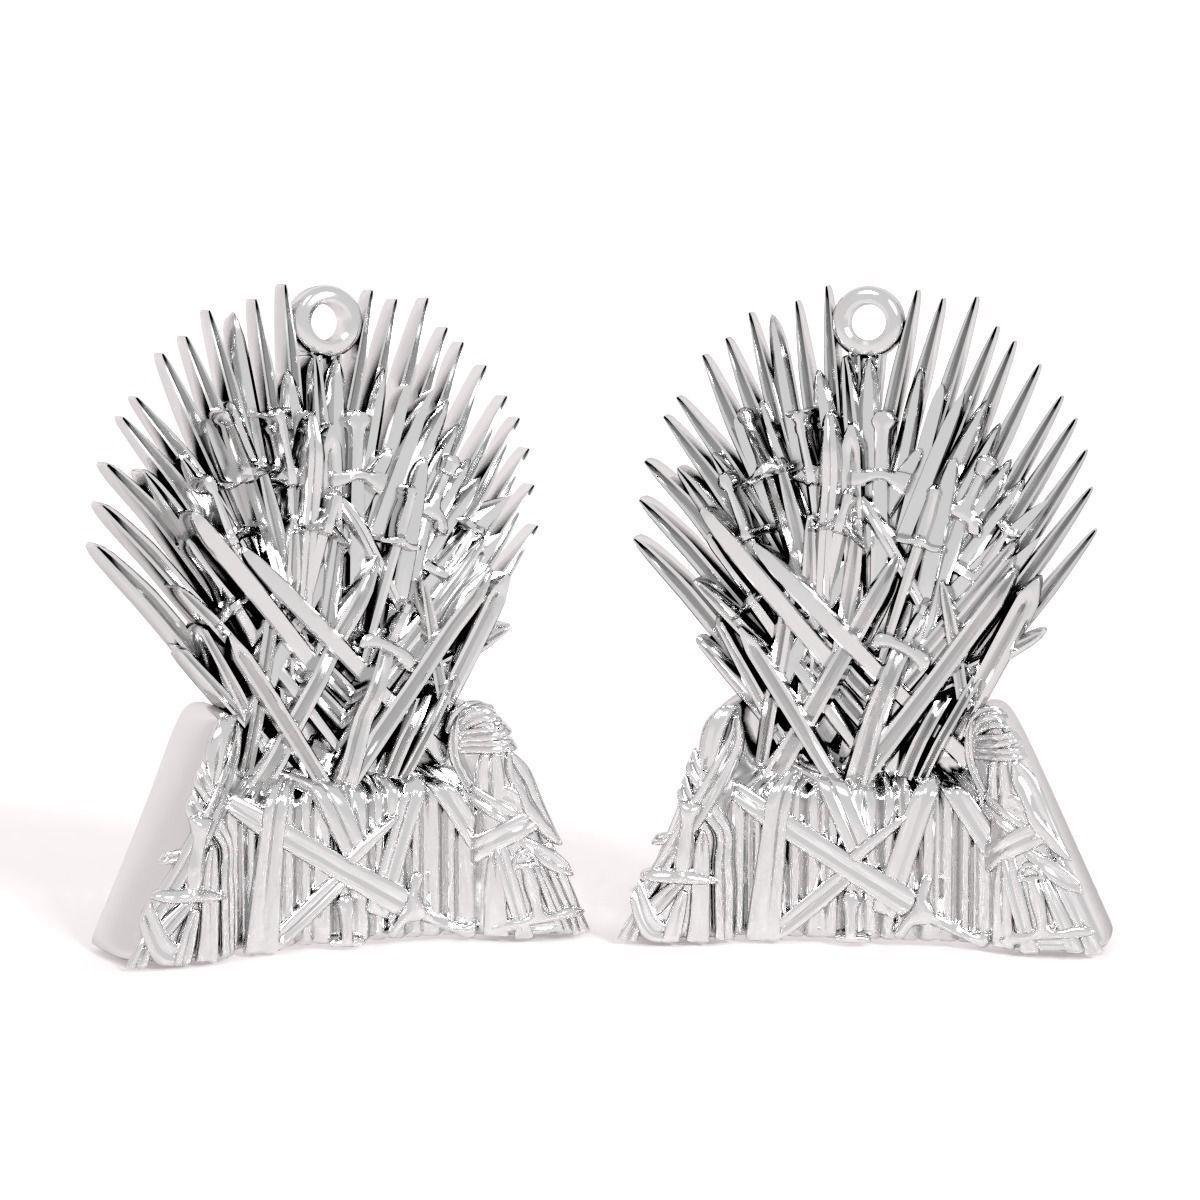 3d Printable Model Pendant Iron Throne Cgtrader